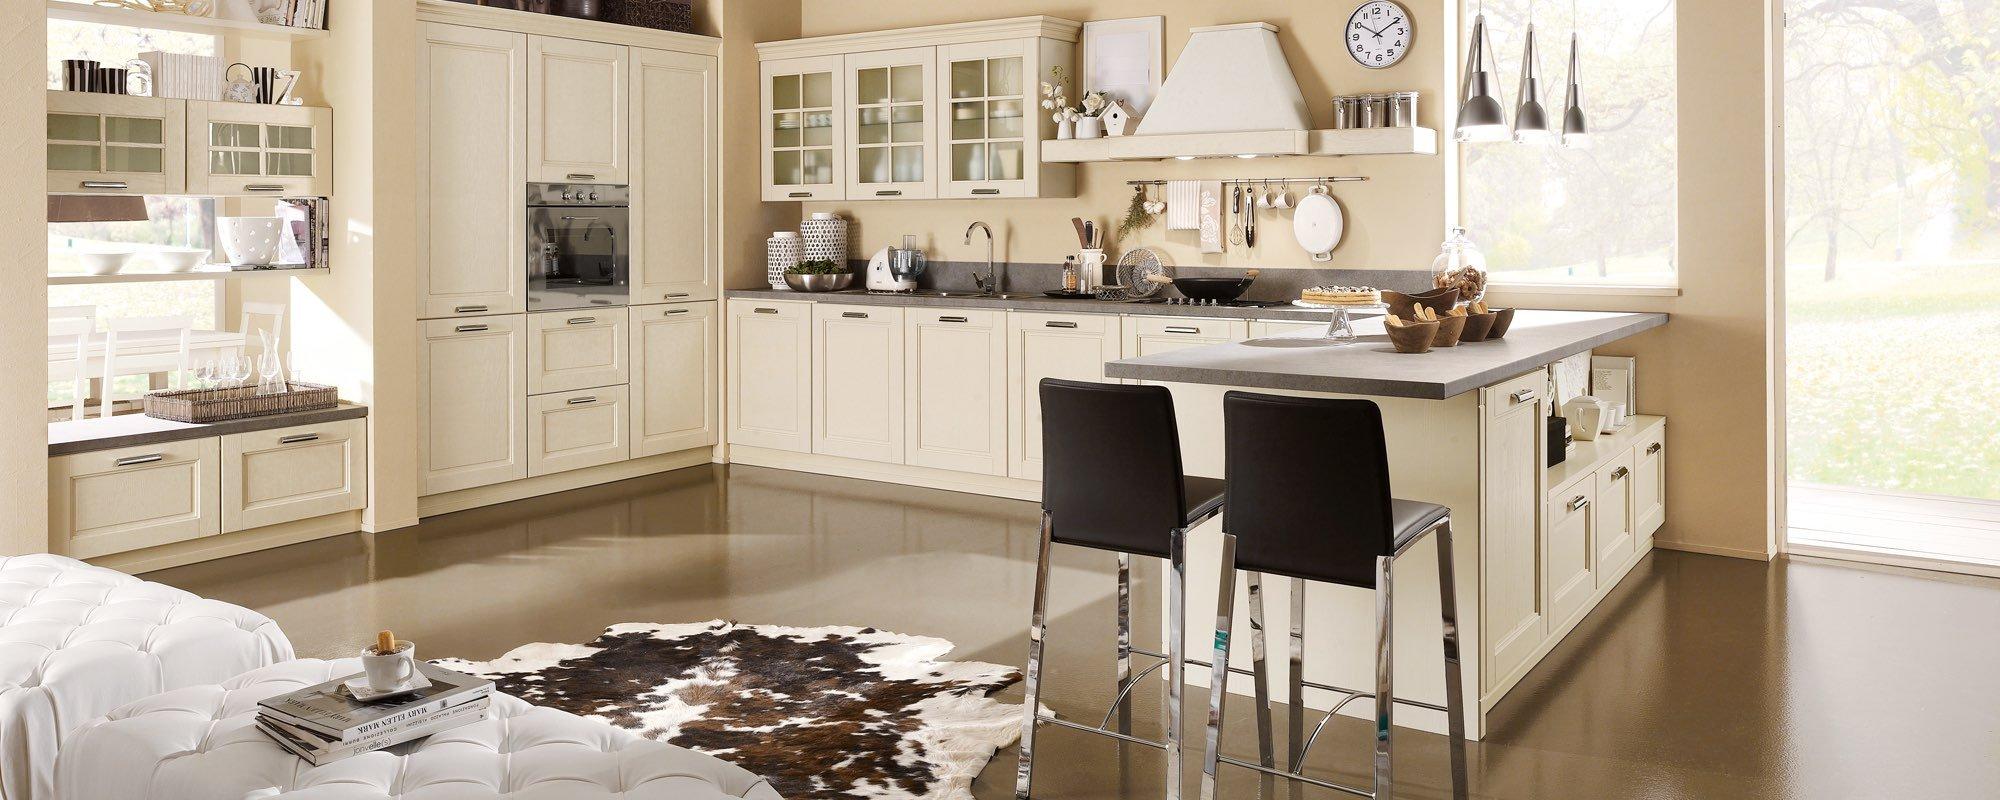 vista frontale di una cucina componibile con sedie nera -ONTARIO